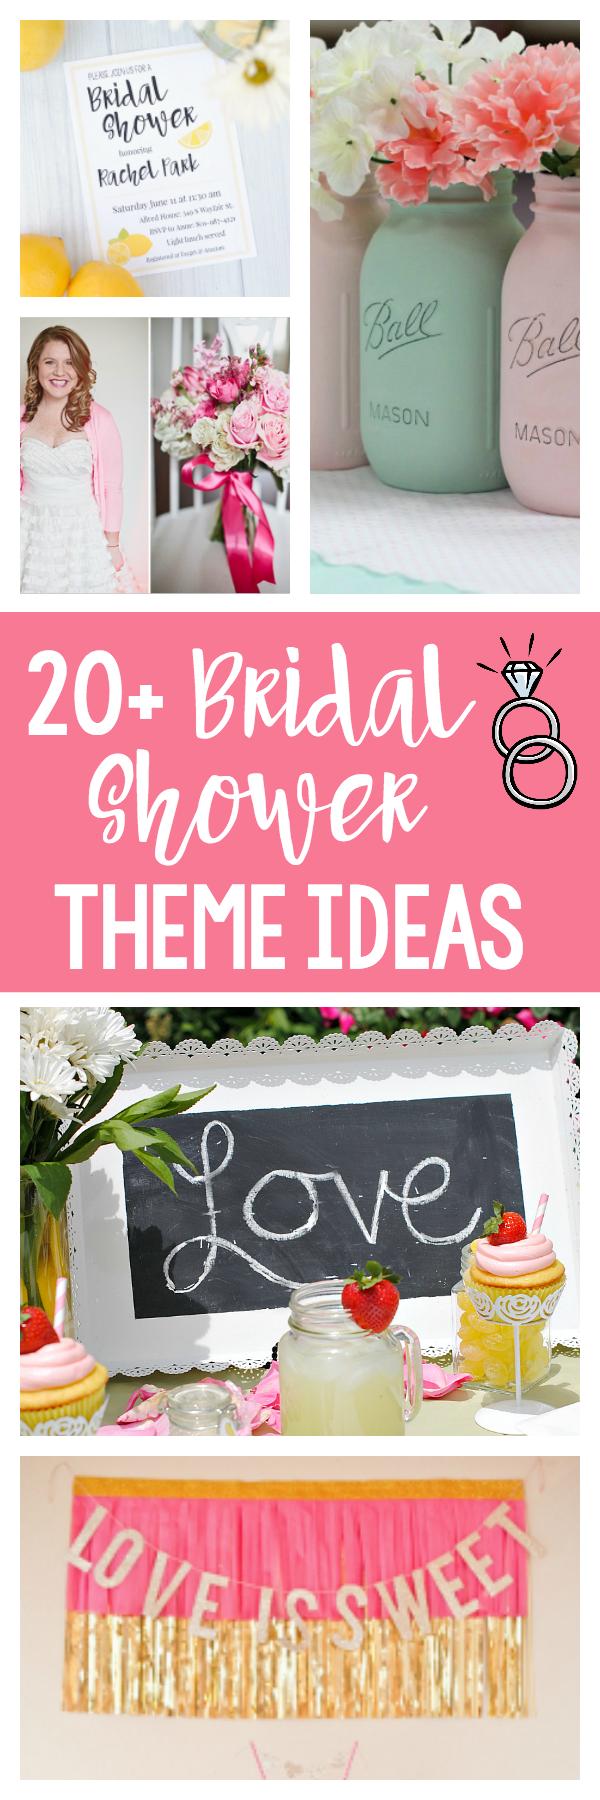 Bridal Shower Theme Ideas